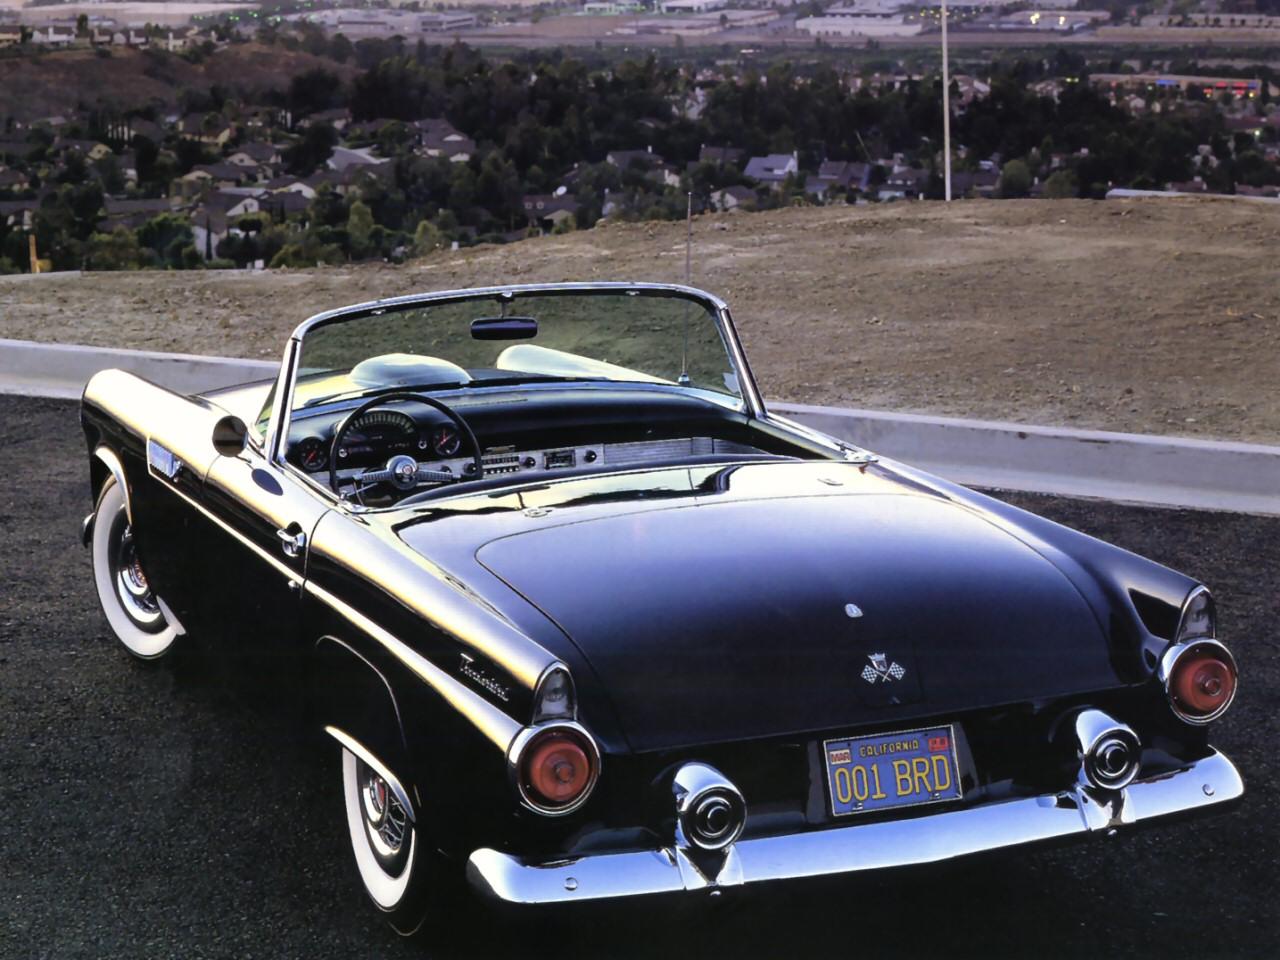 1955 dodge royal lancer convertible cream black fvr cars - 44 1955 Ford Thunderbird Roadster Black